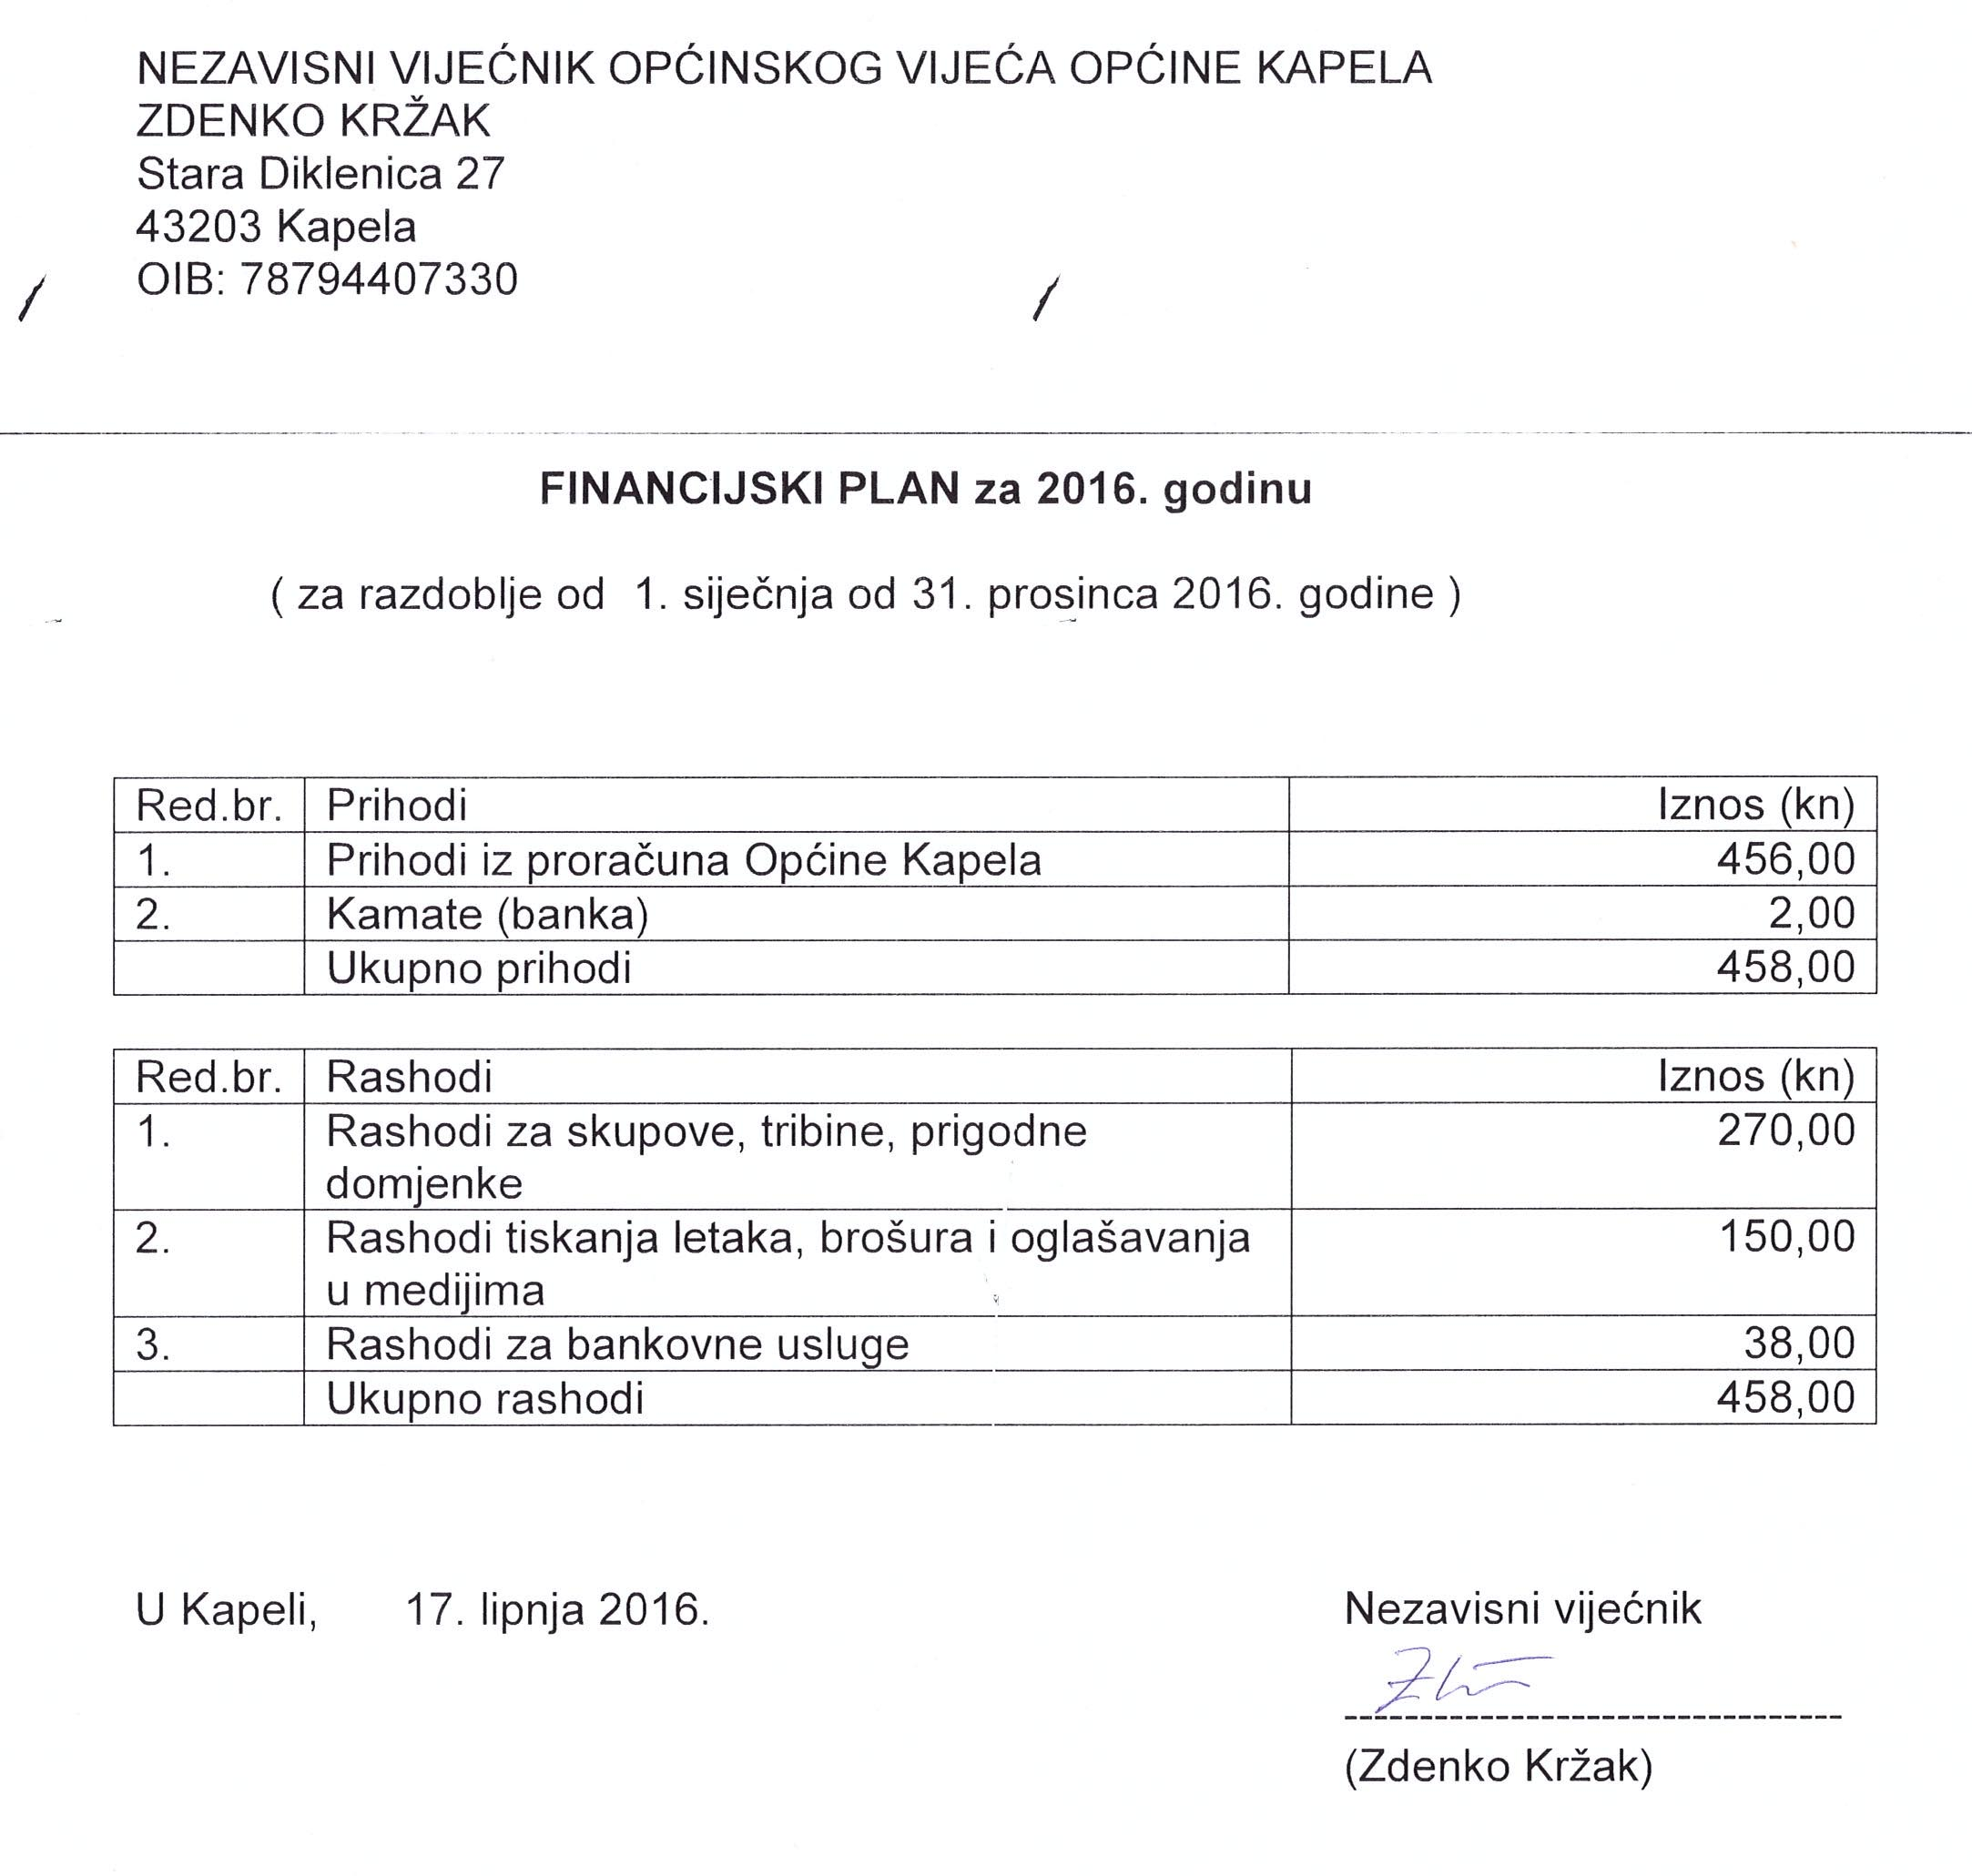 Financijski plan